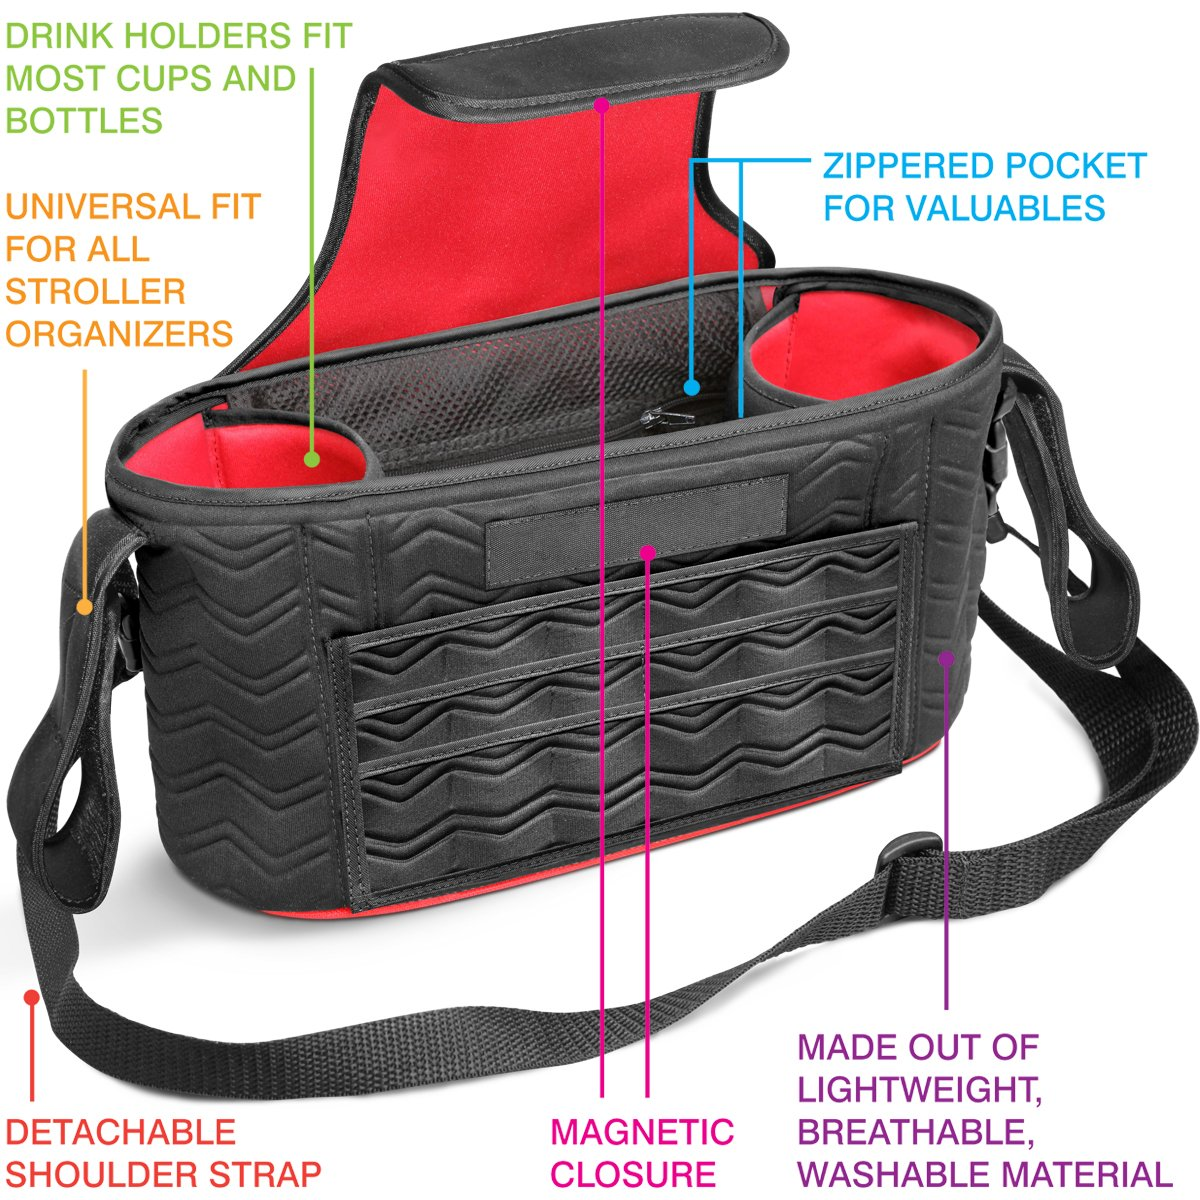 Universal Baby Stroller Organizer Bag 2 Zippered Pockets Many Compartments Two Deep Bottle Holders Magnetic Closure Best Stroller Organizer Detachable BONUS Shoulder Strap A MUST HAVE for Parents!